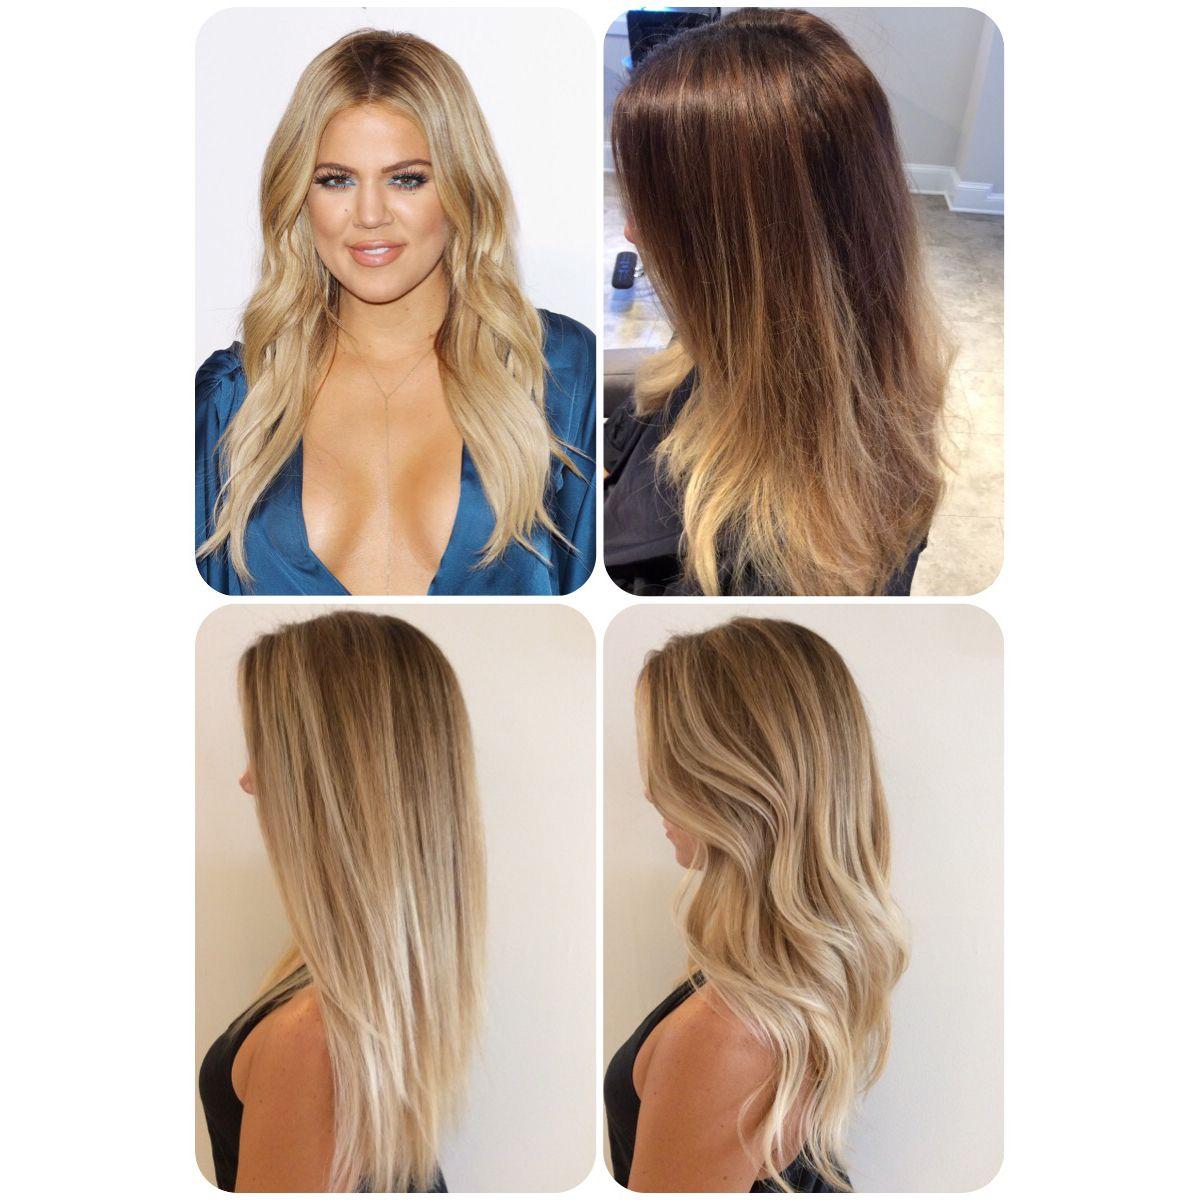 Khloe Kardashian inspired blonde